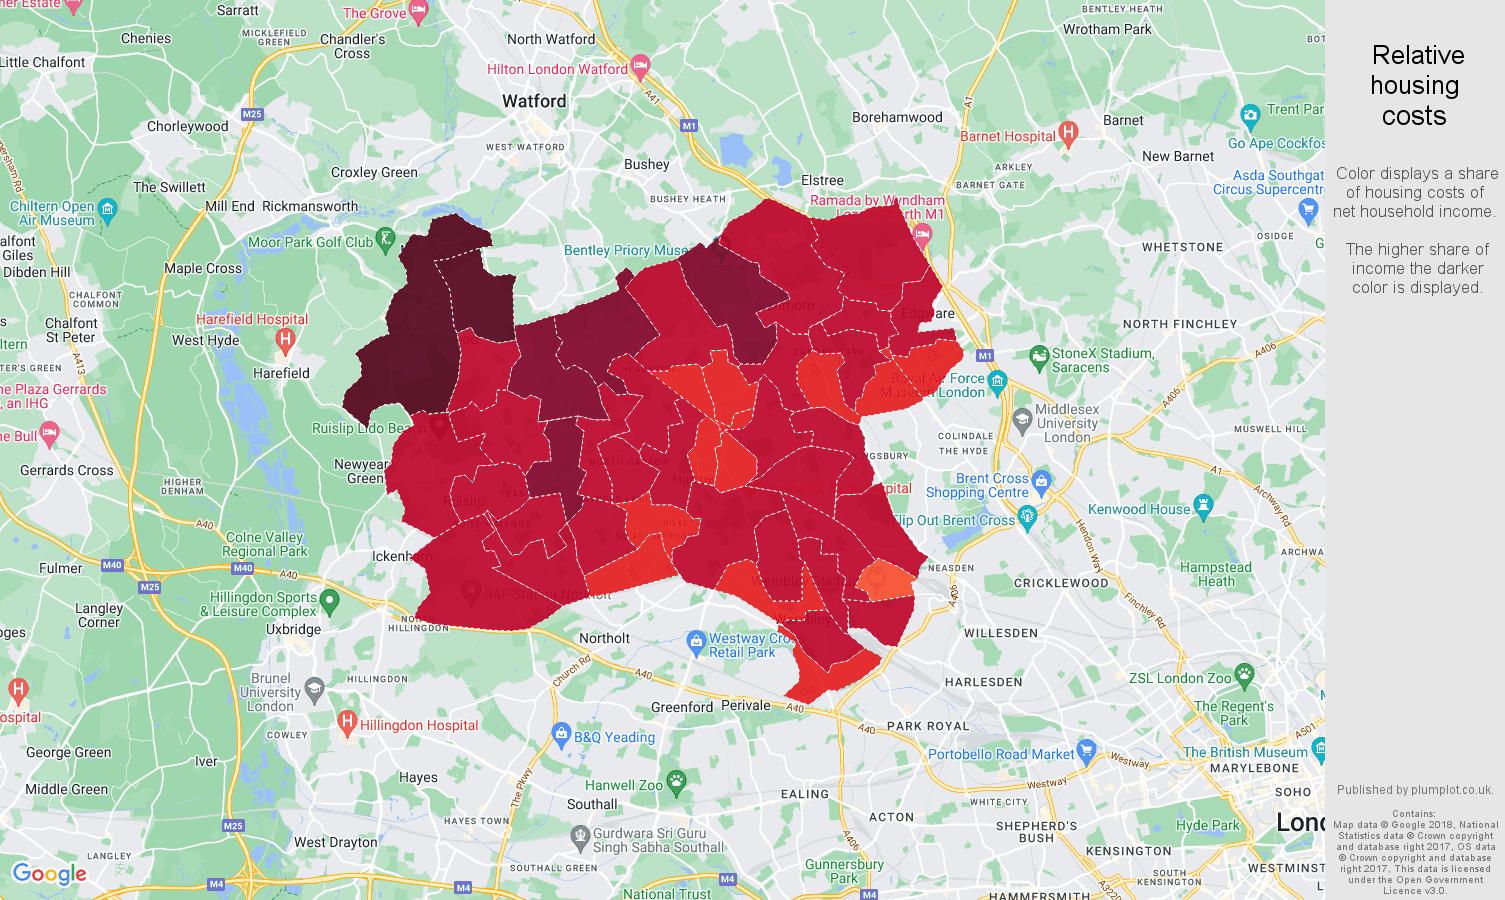 Harrow relative housing costs map